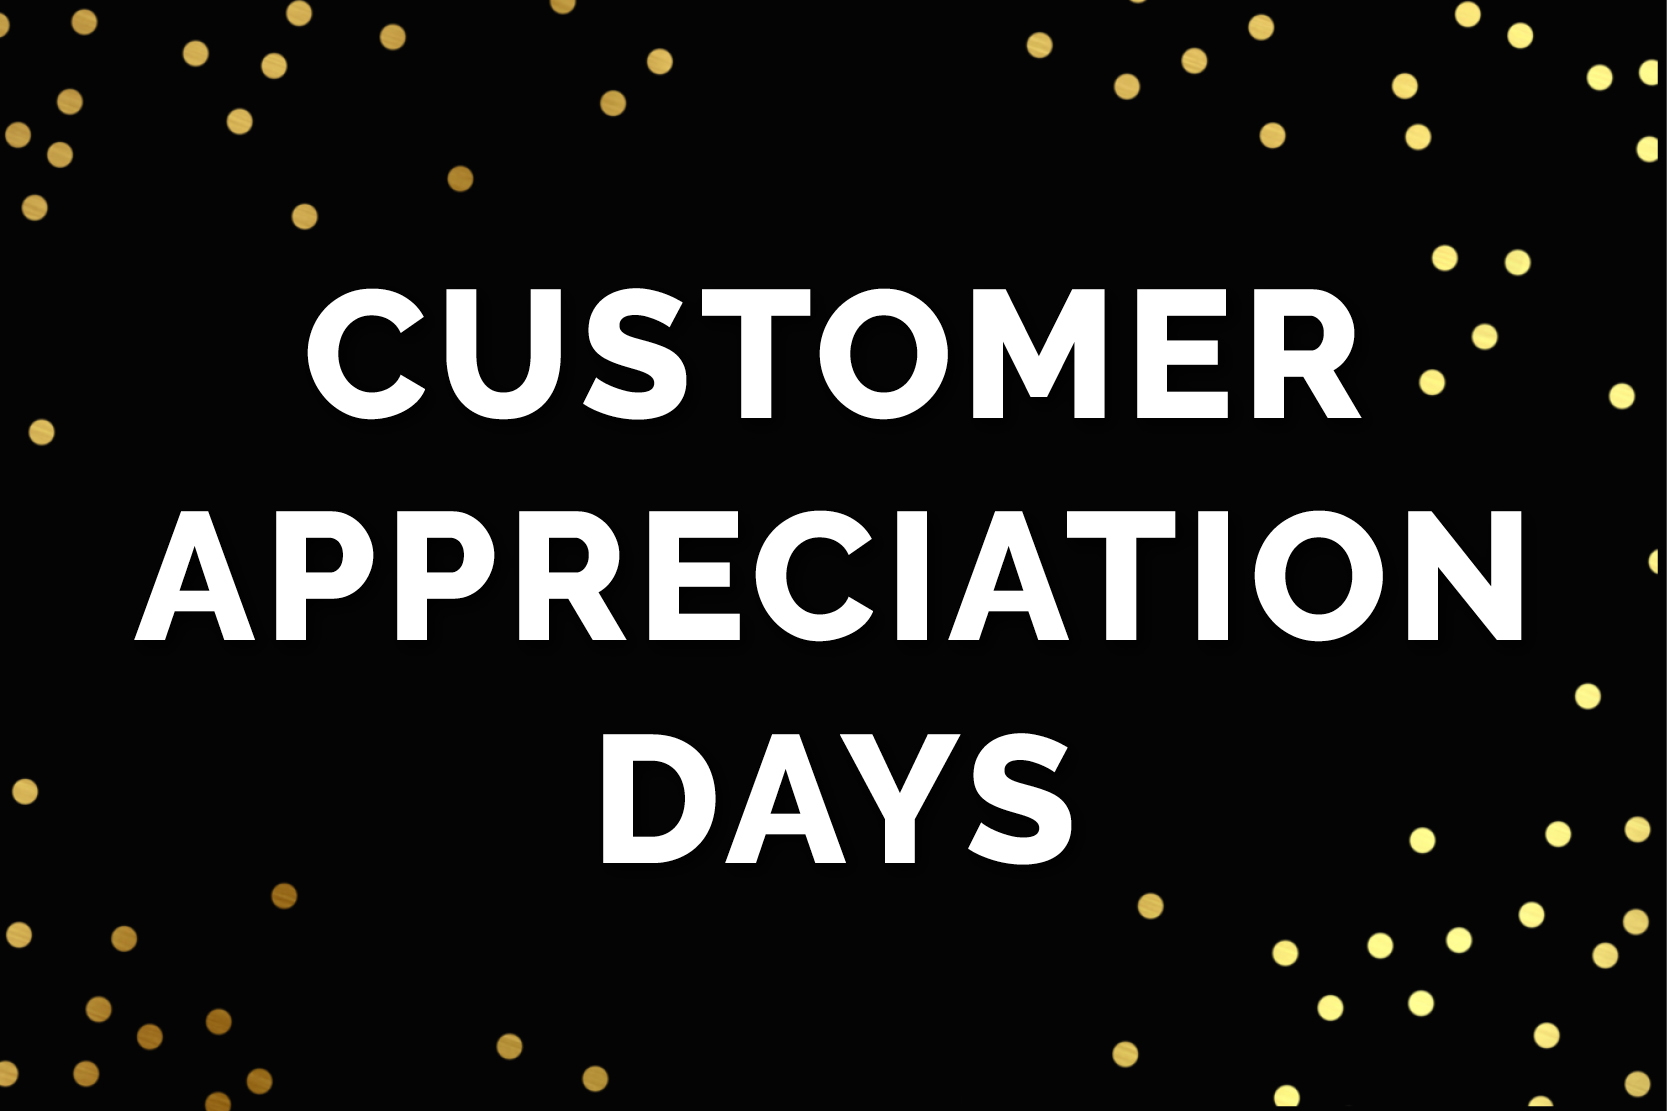 Customer Appreciation Days